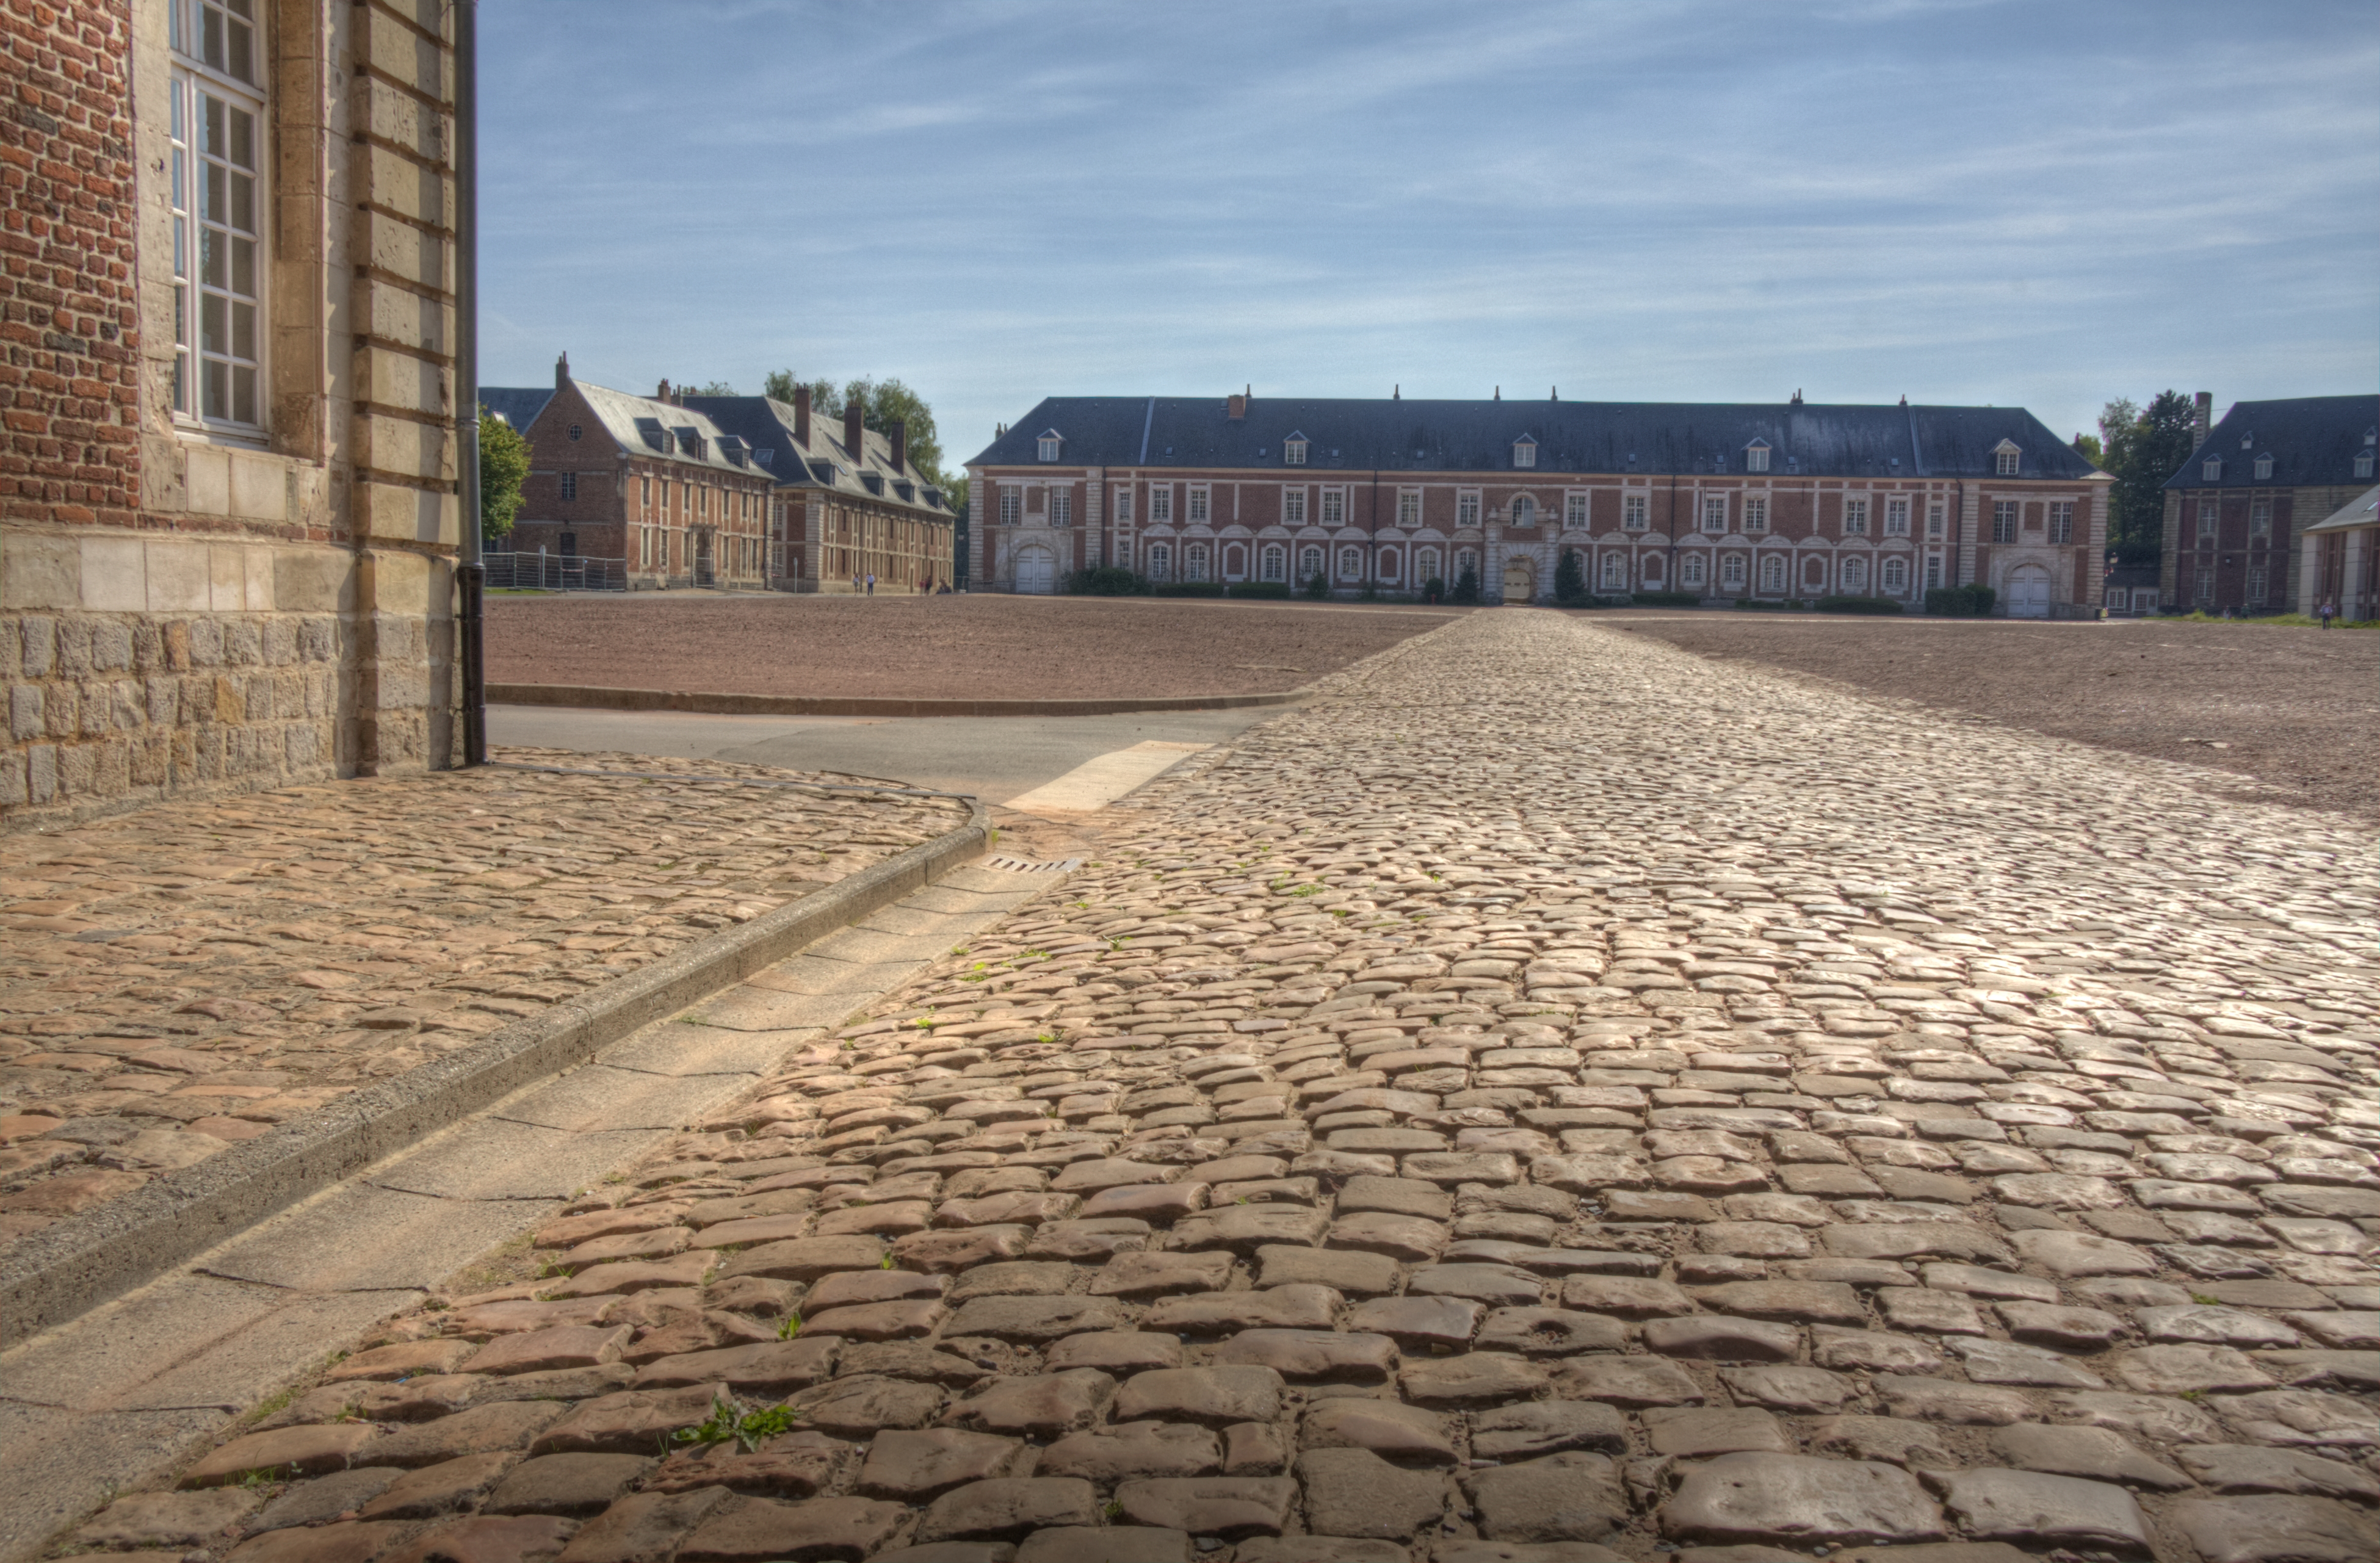 Arras_citadelle01.jpg